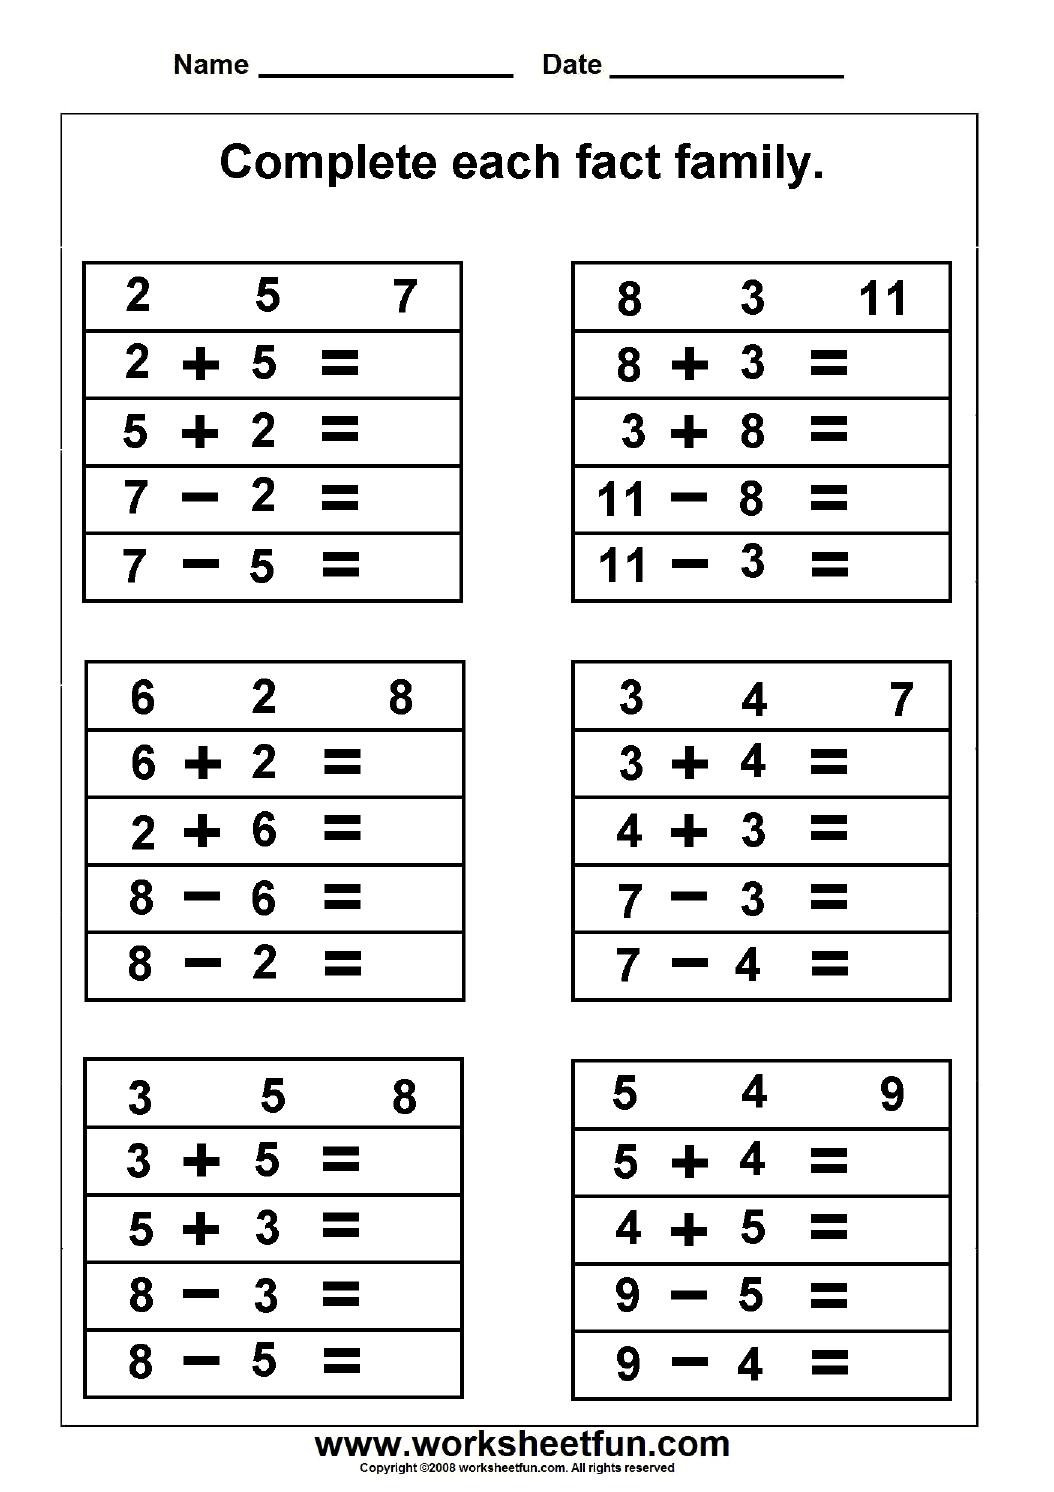 Multiplication Fact Family Worksheets 3rd Grade Free Worksheets